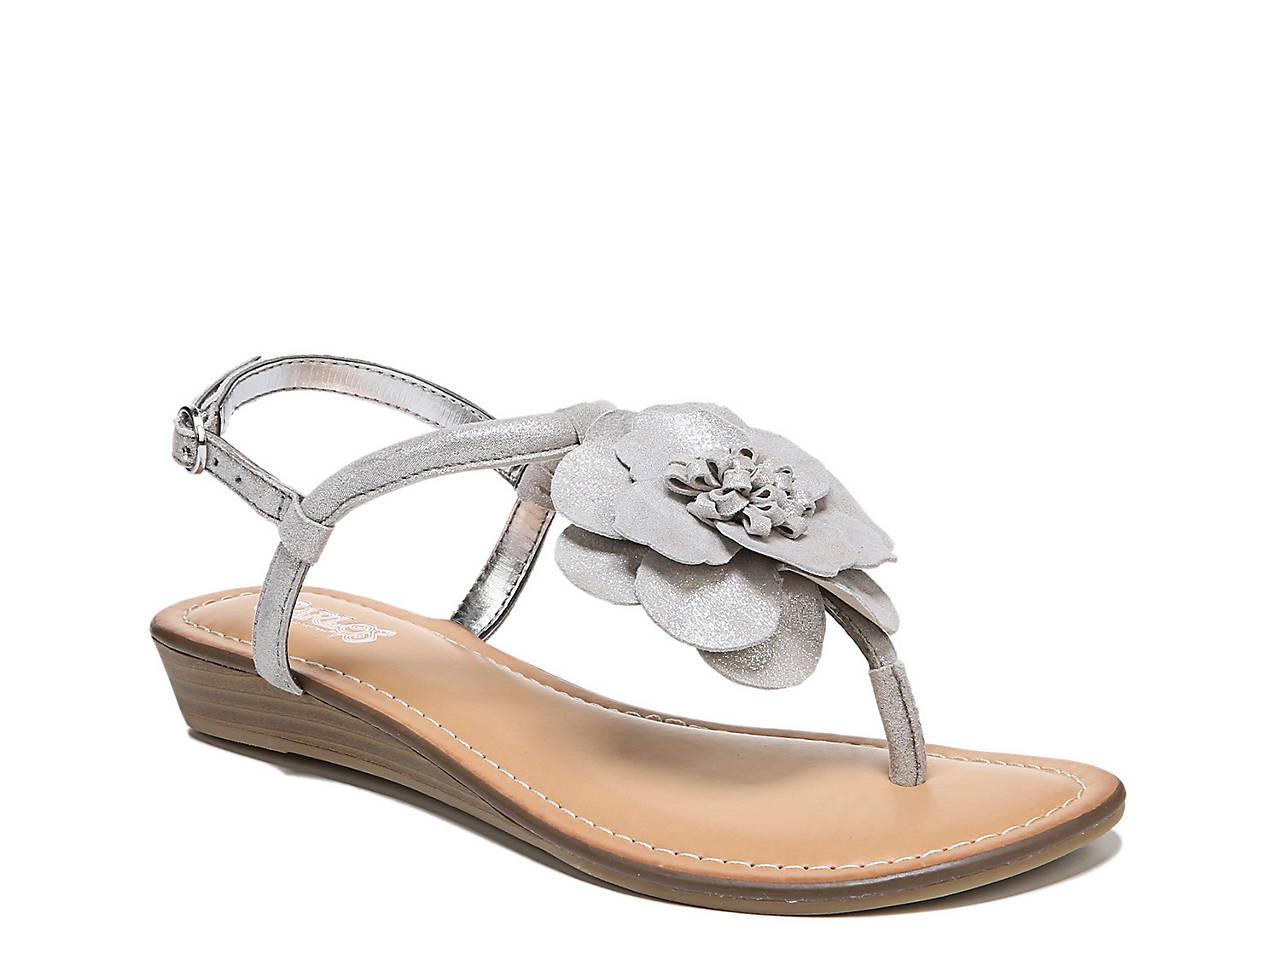 813f4082174d Carlos by Carlos Santana Tegan Wedge Sandal Women s Shoes